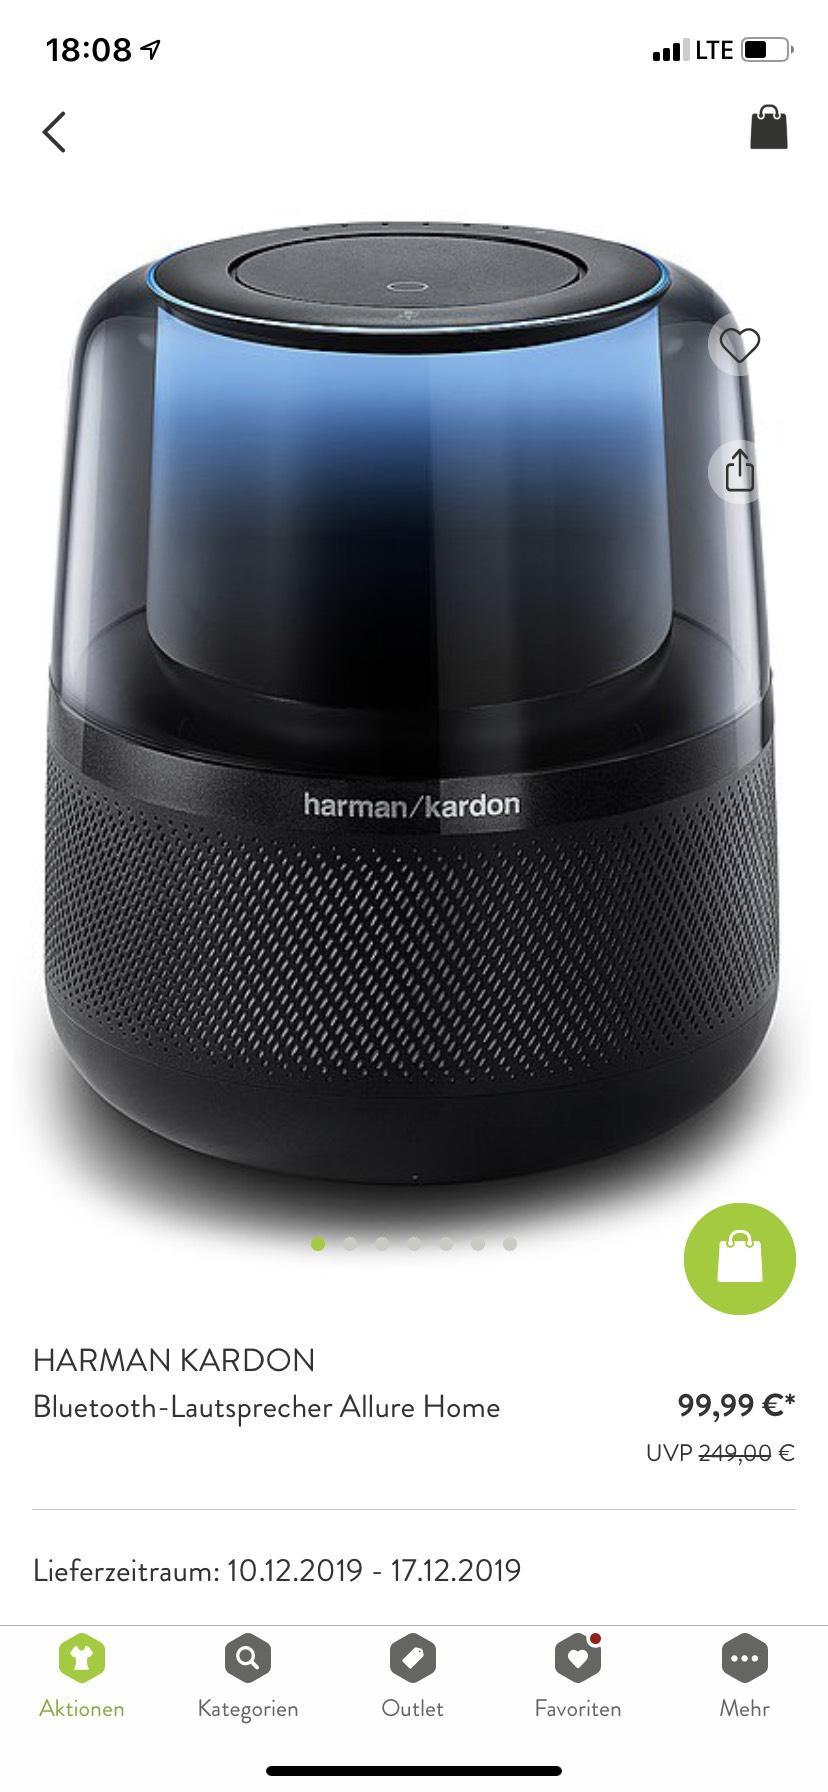 Harman kardon allure home Bluetooth Lautsprecher